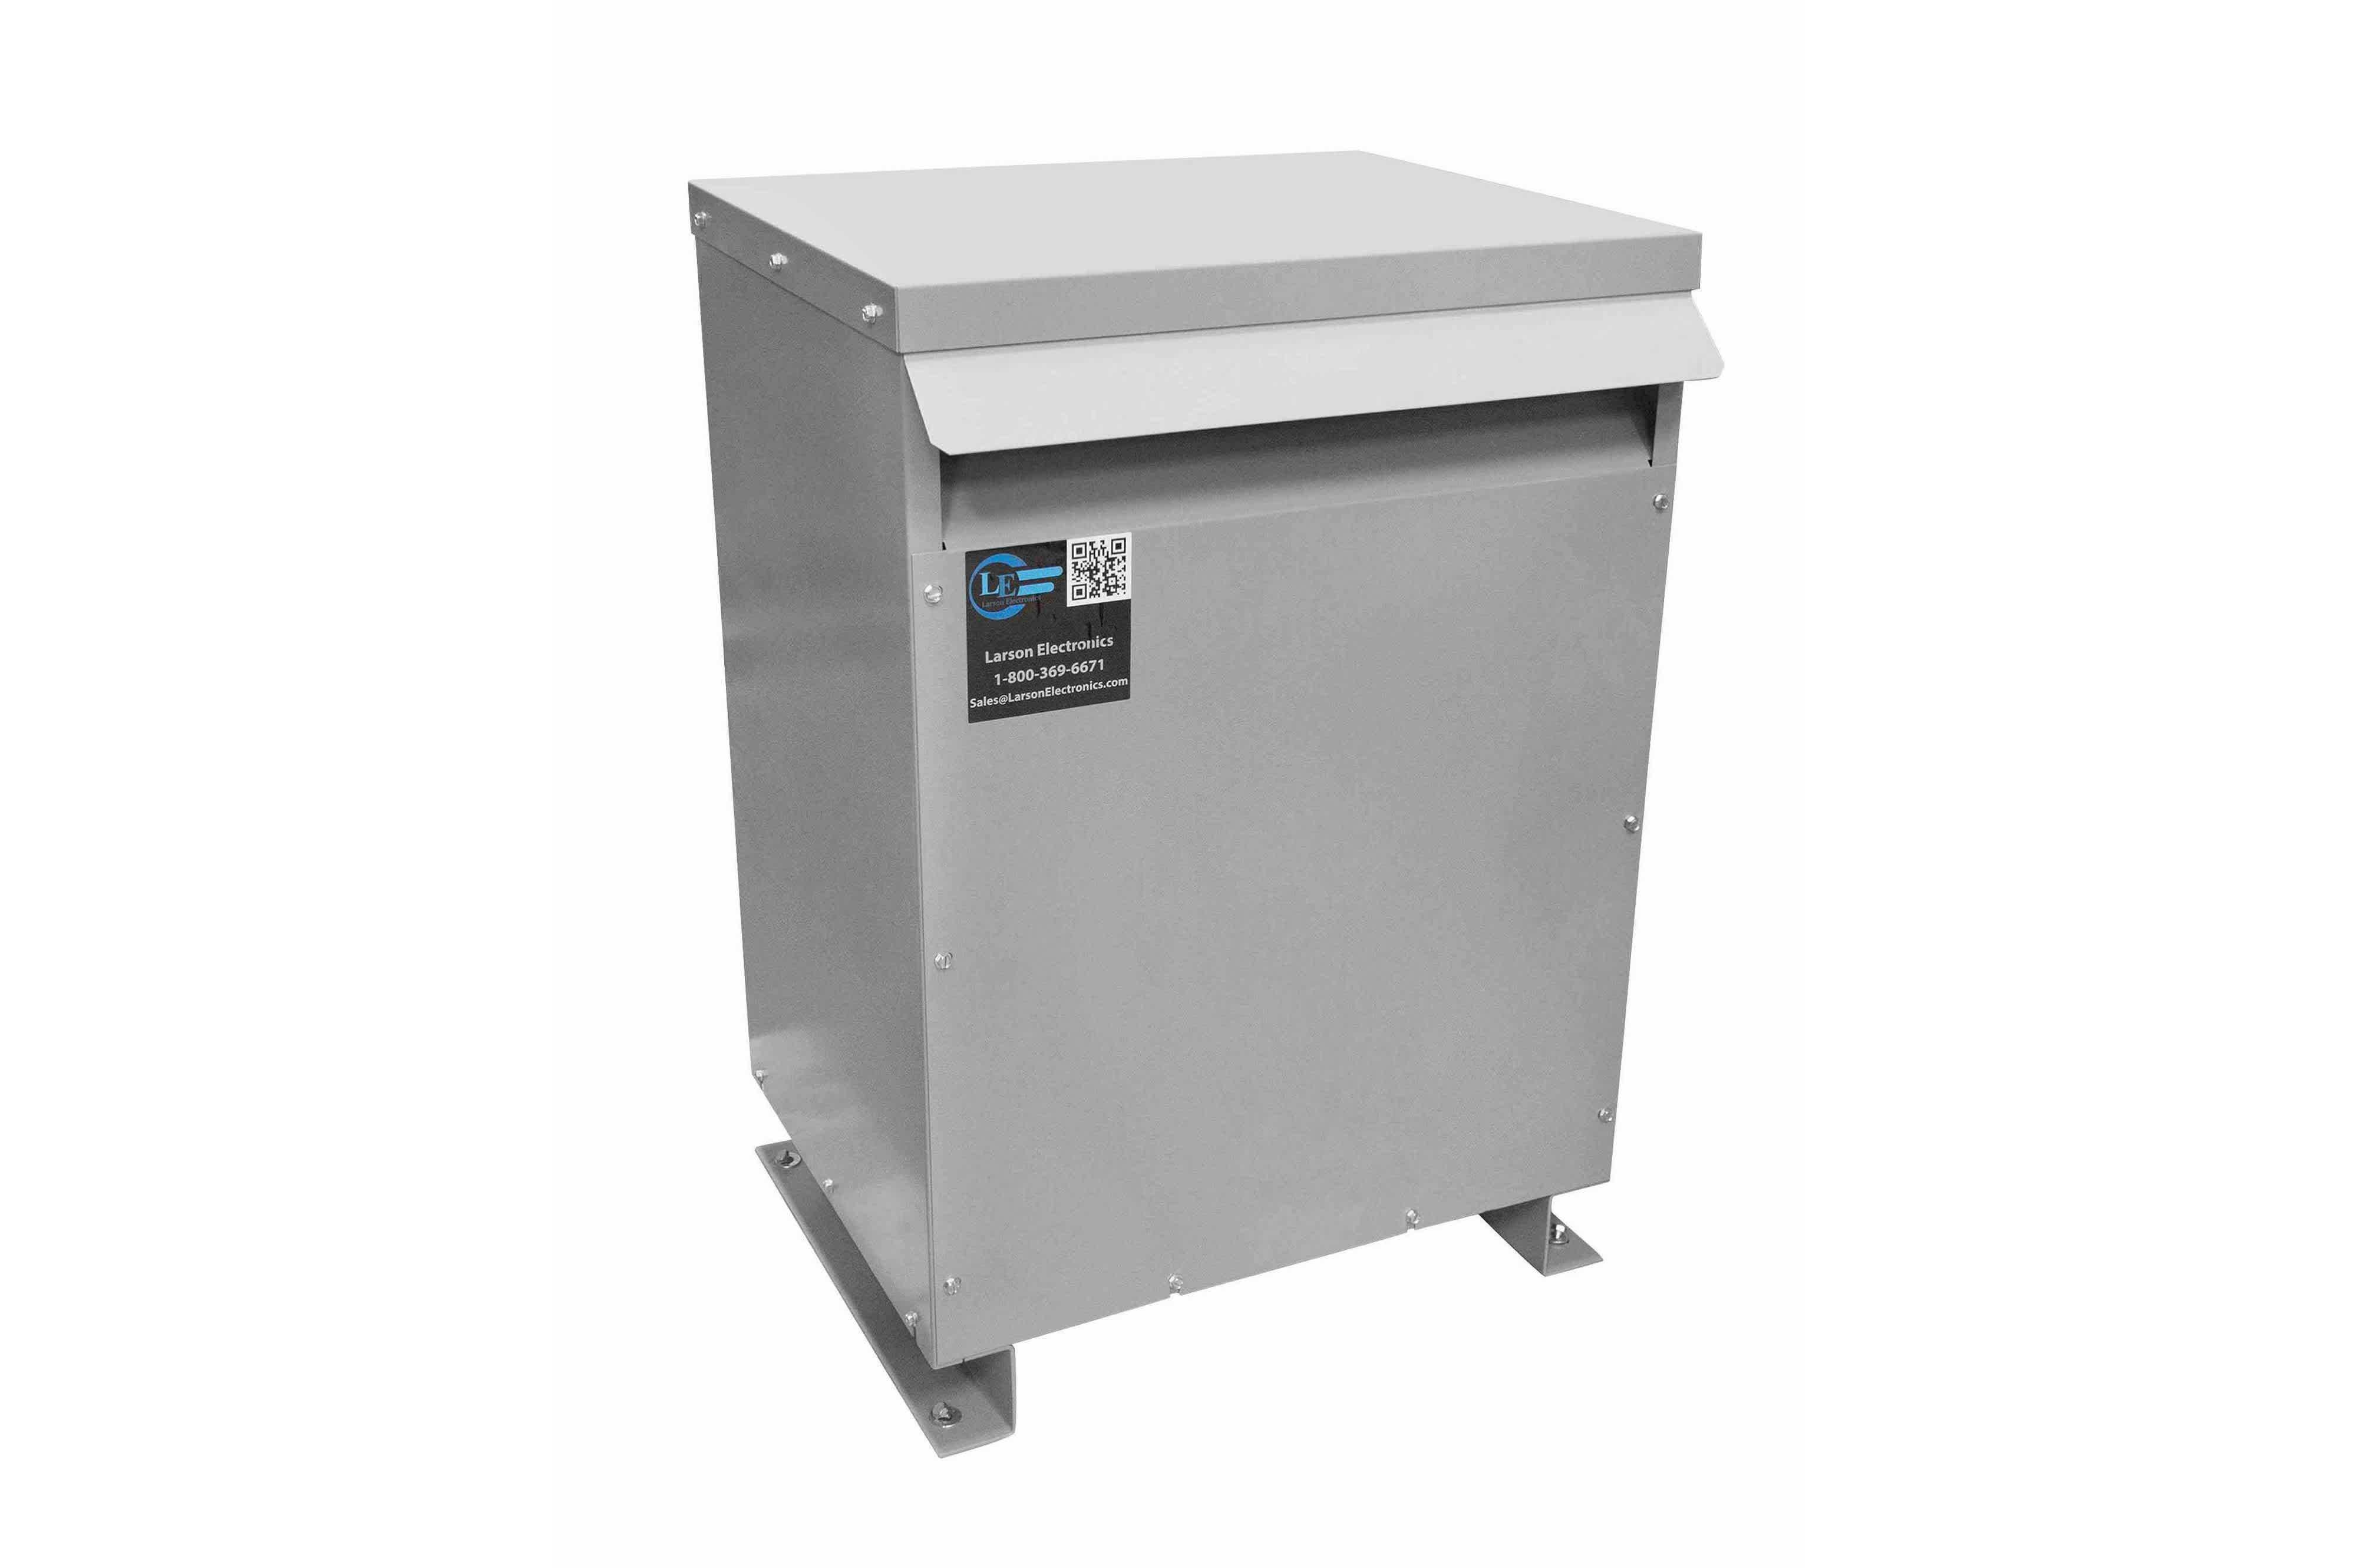 167 kVA 3PH DOE Transformer, 440V Delta Primary, 208Y/120 Wye-N Secondary, N3R, Ventilated, 60 Hz